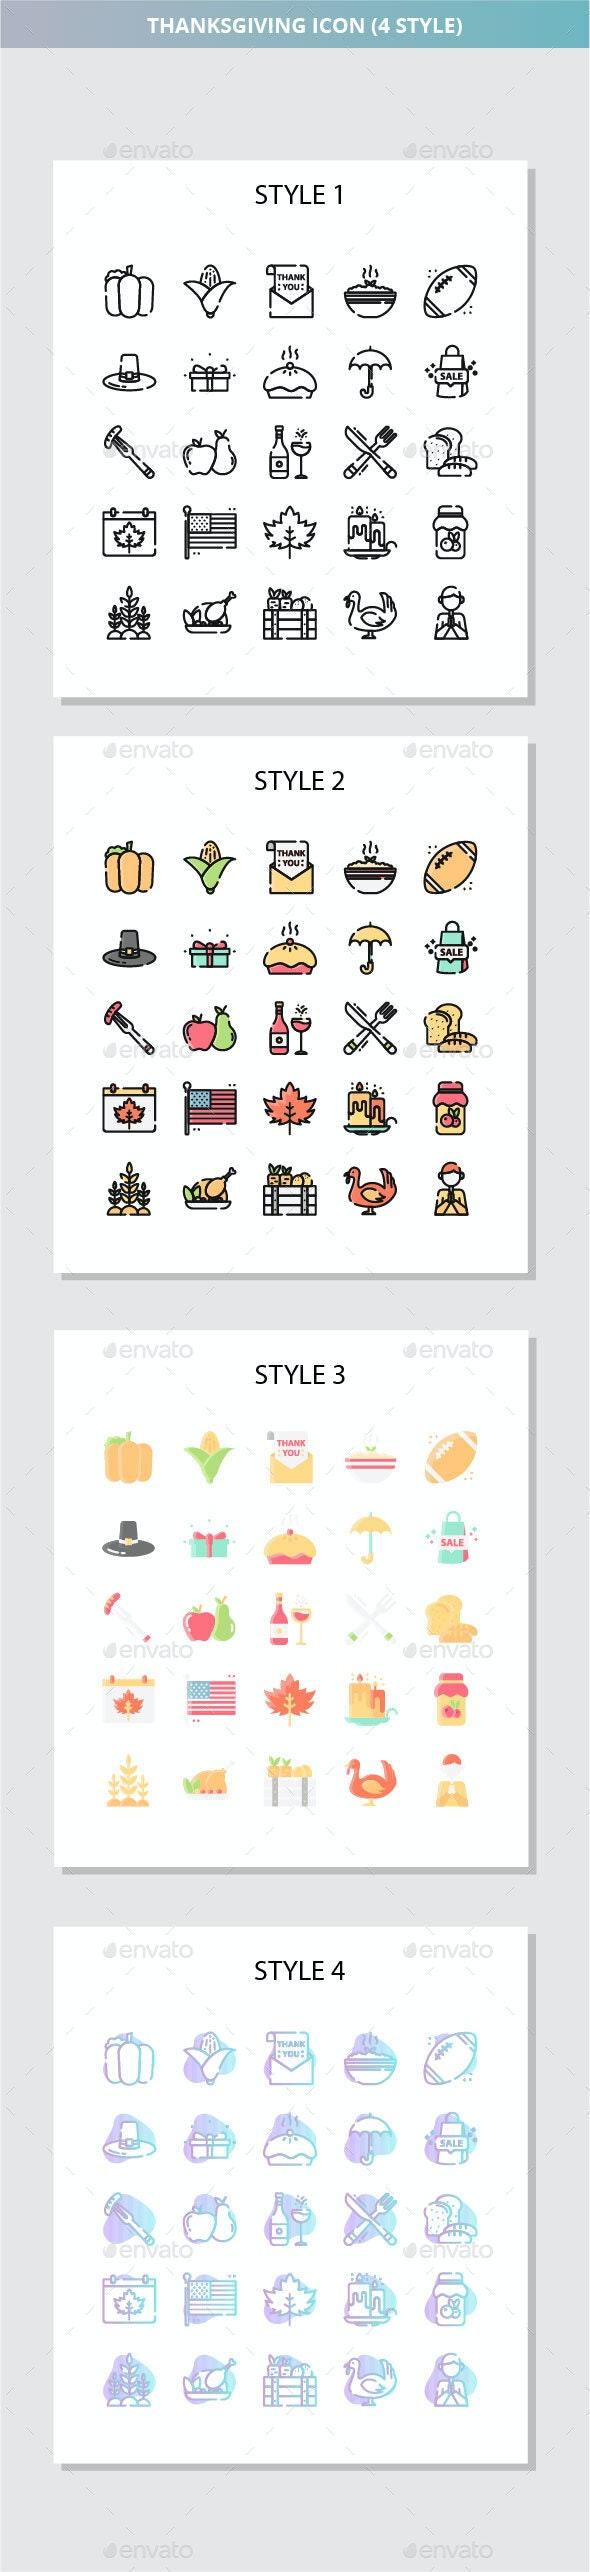 Thanksgiving Iconset - Seasonal Icons